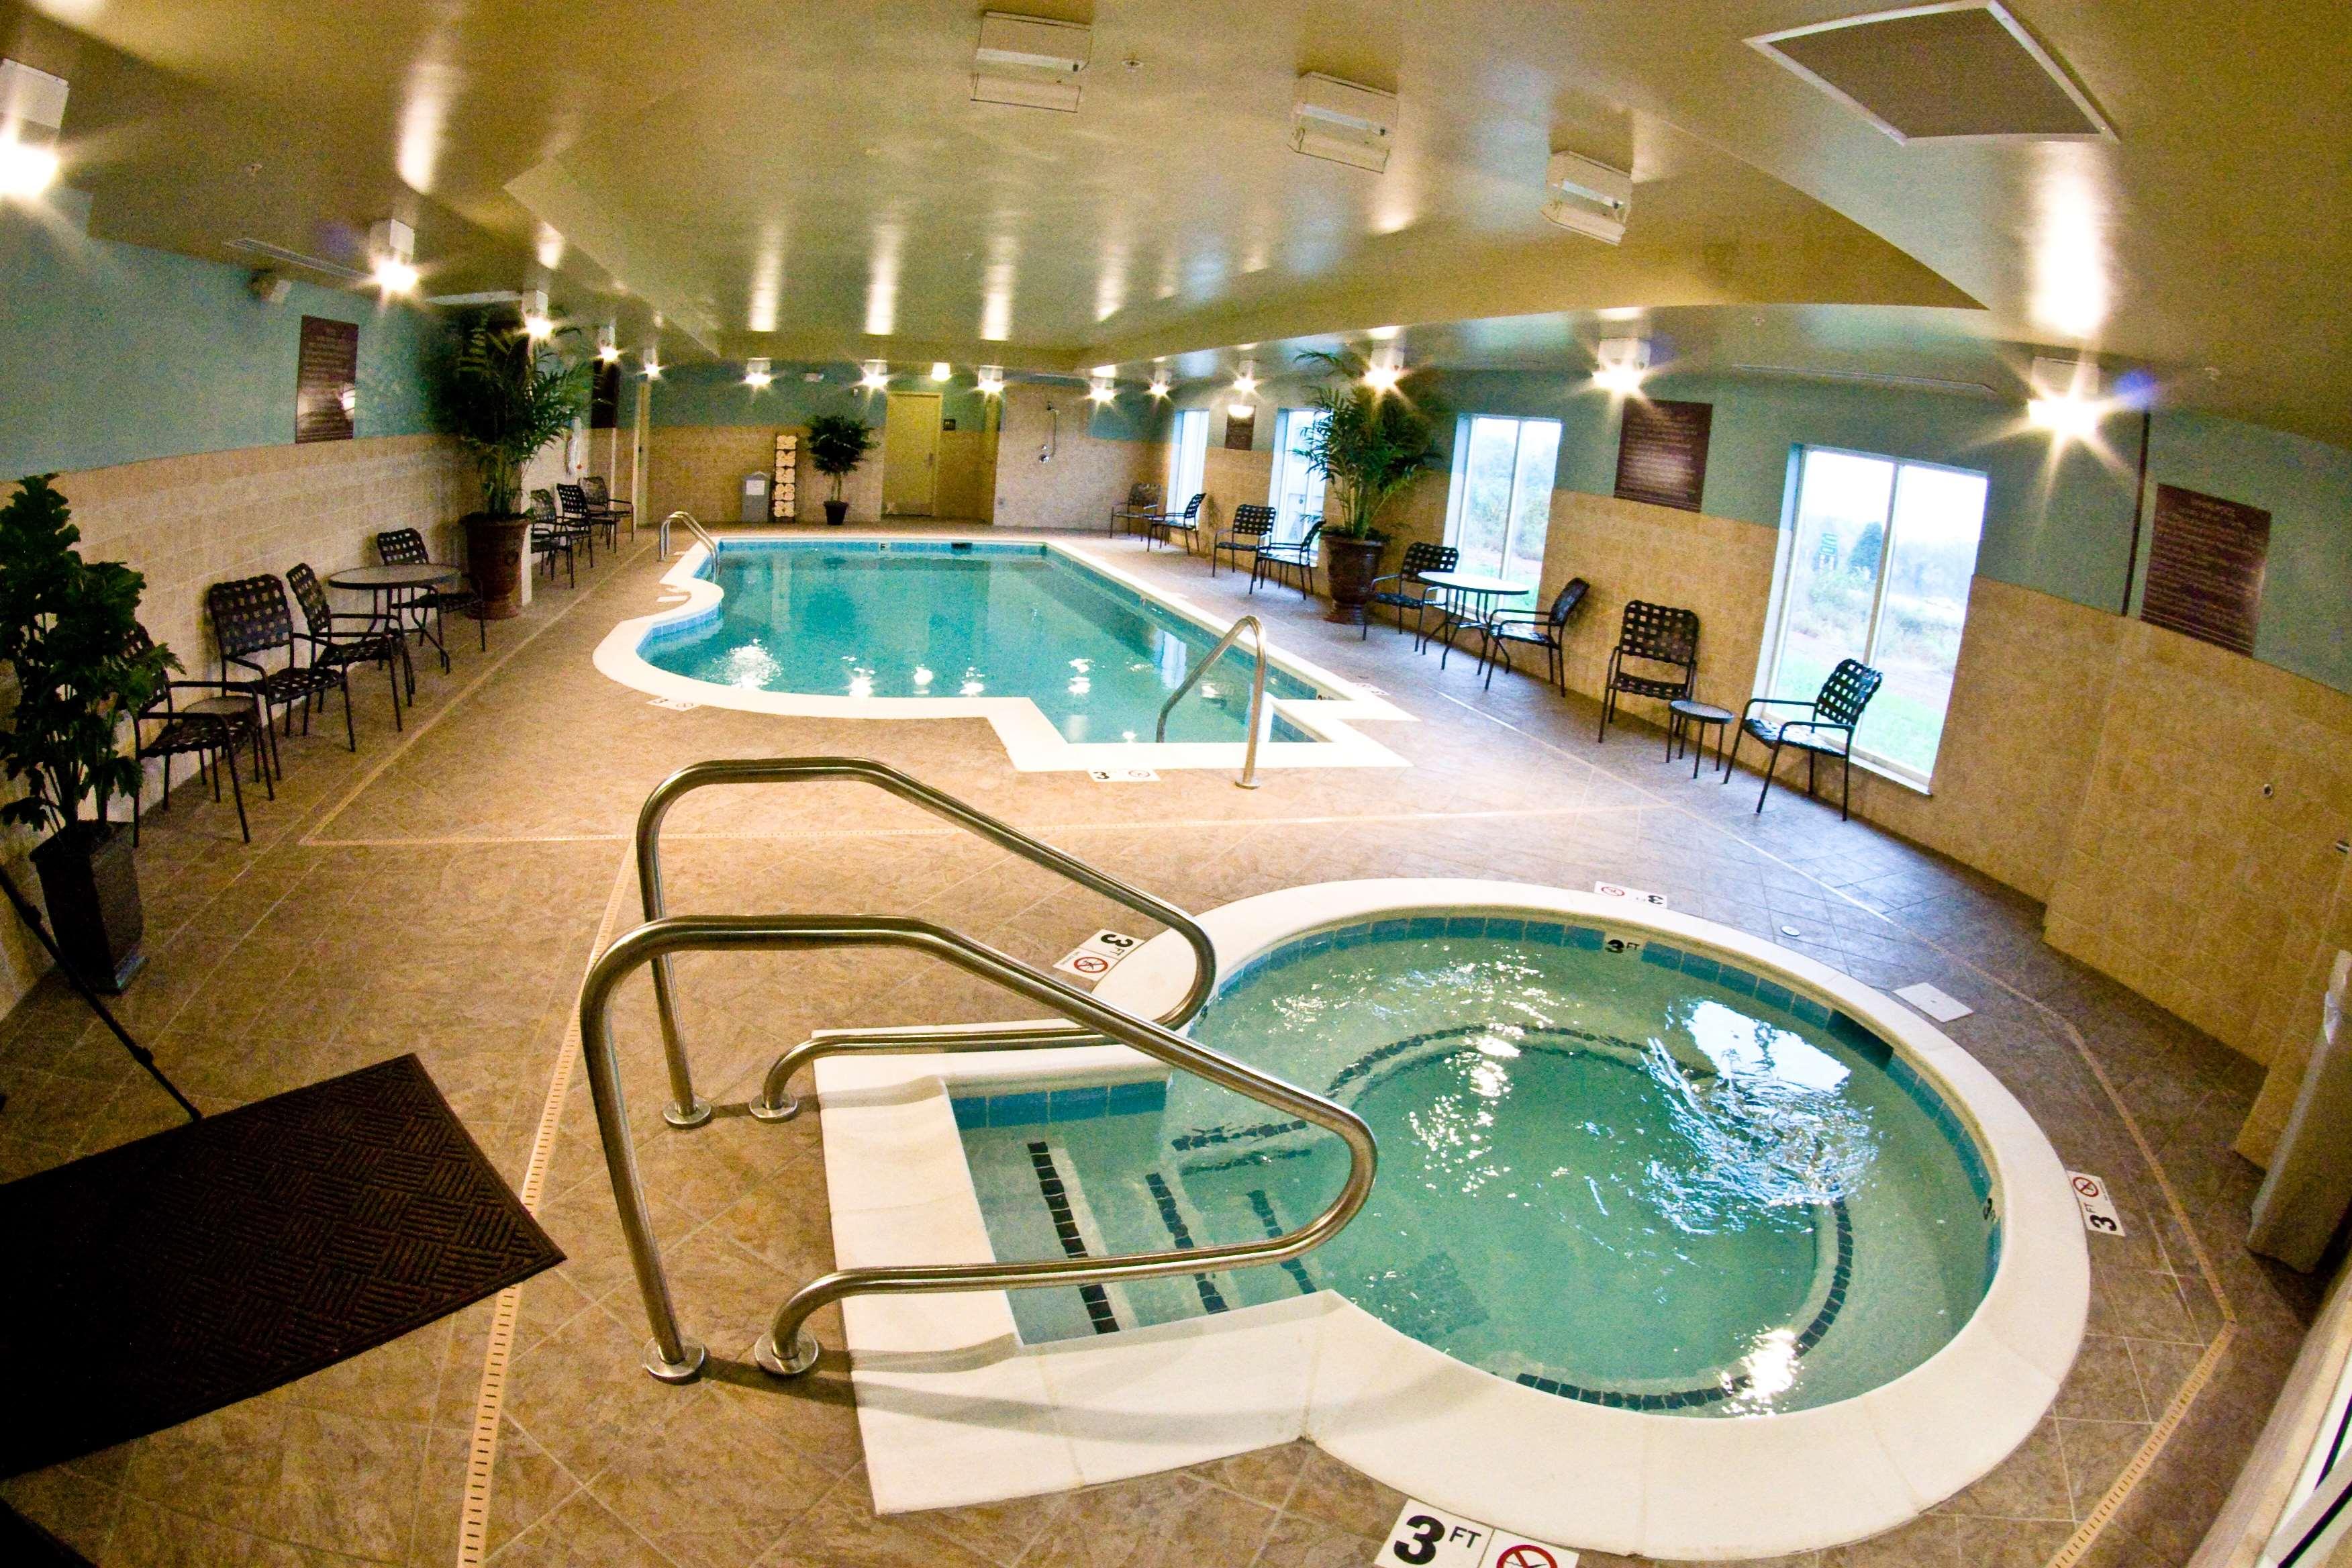 Hilton Garden Inn Clarksville image 15